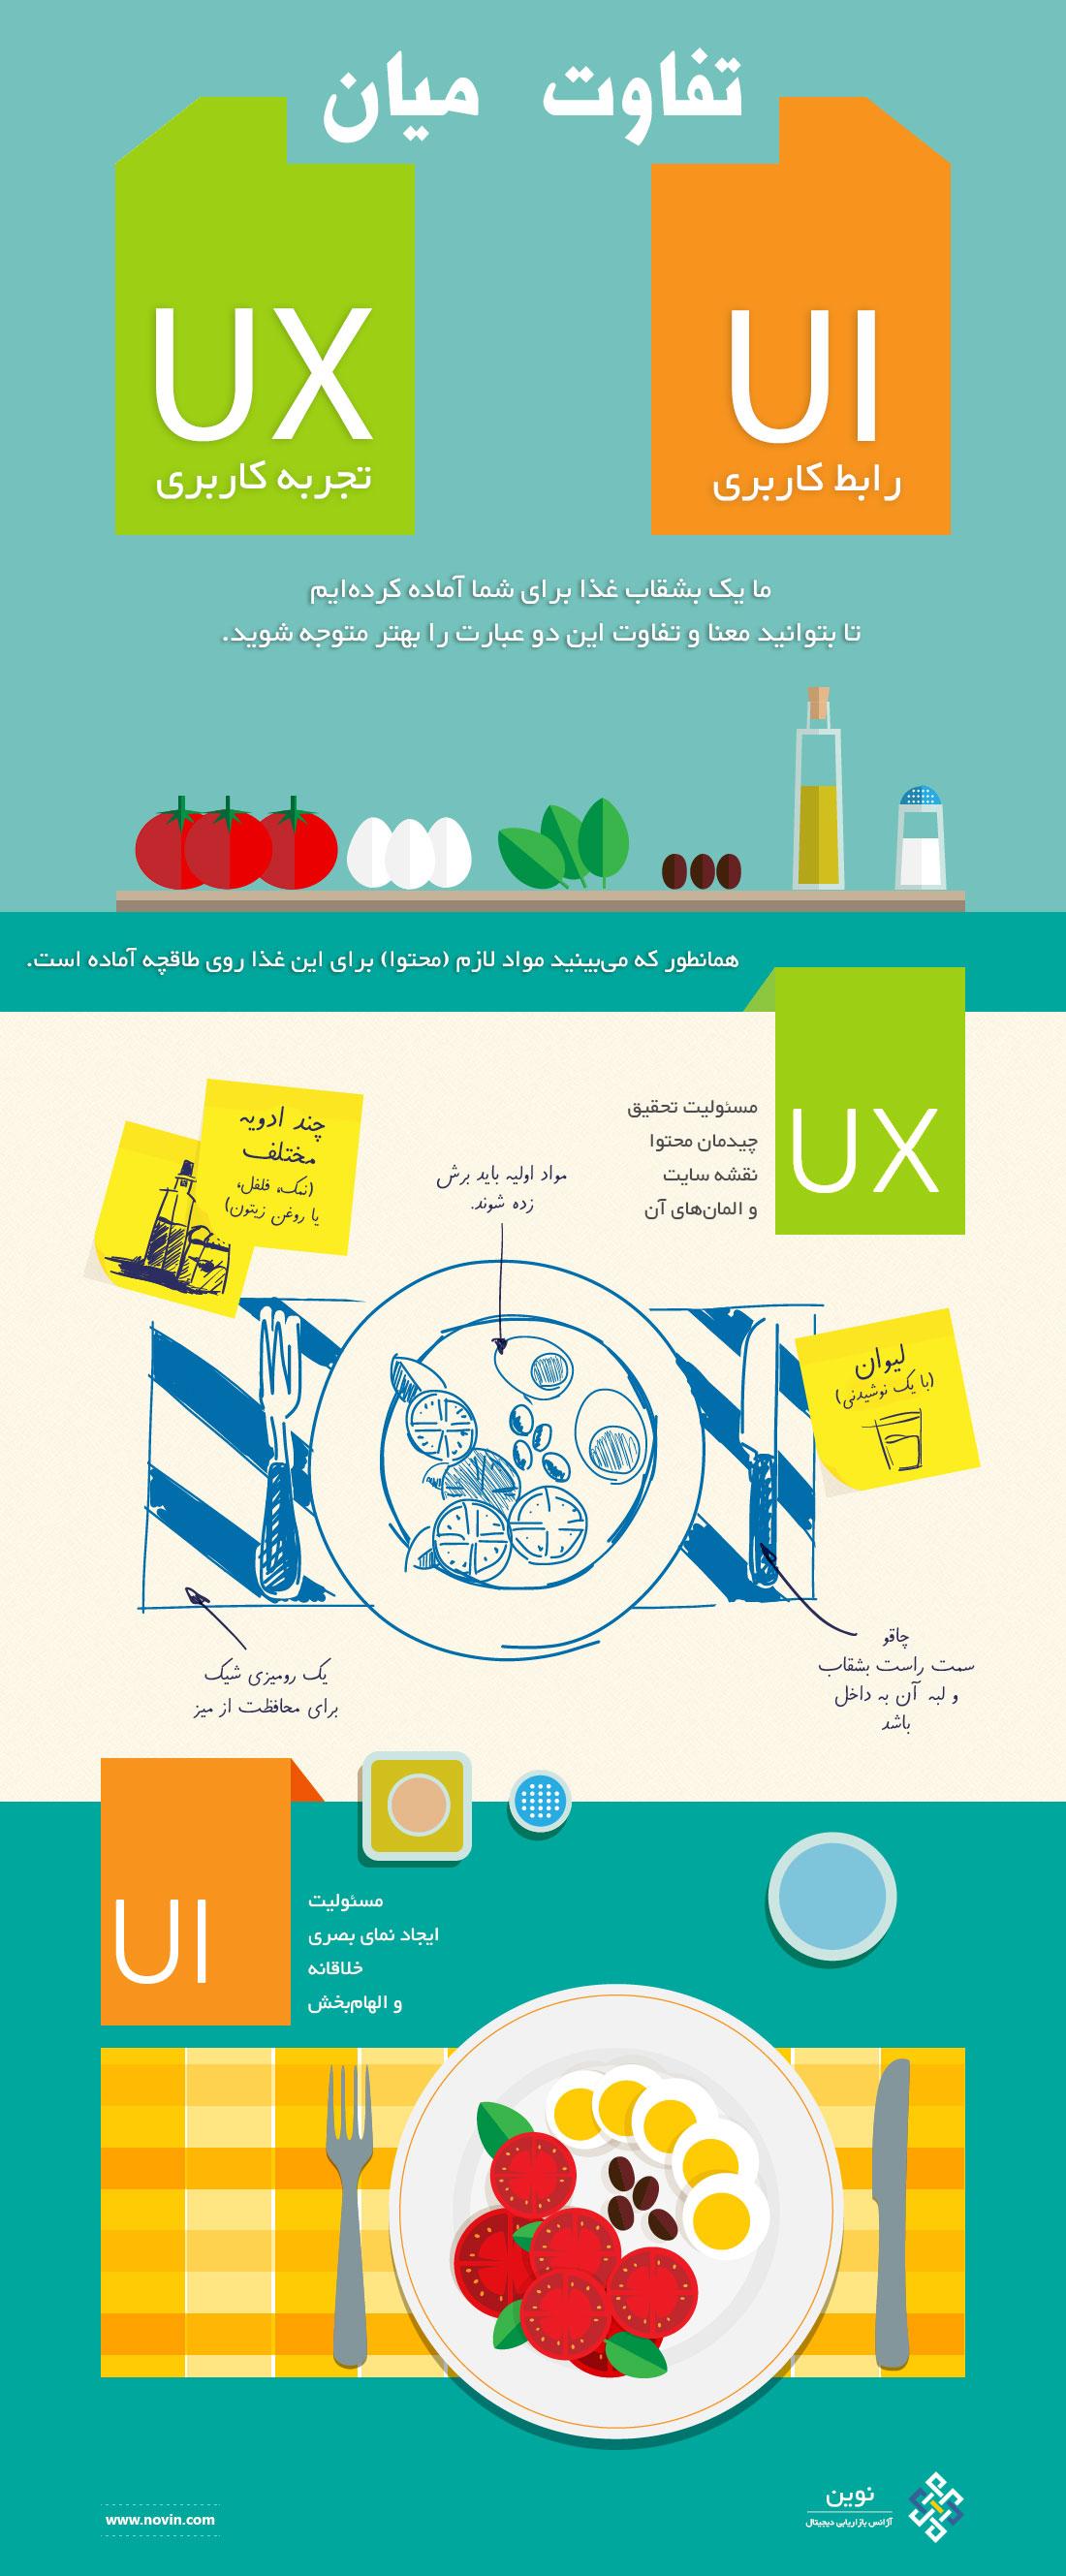 تفاوت میان UX و UI